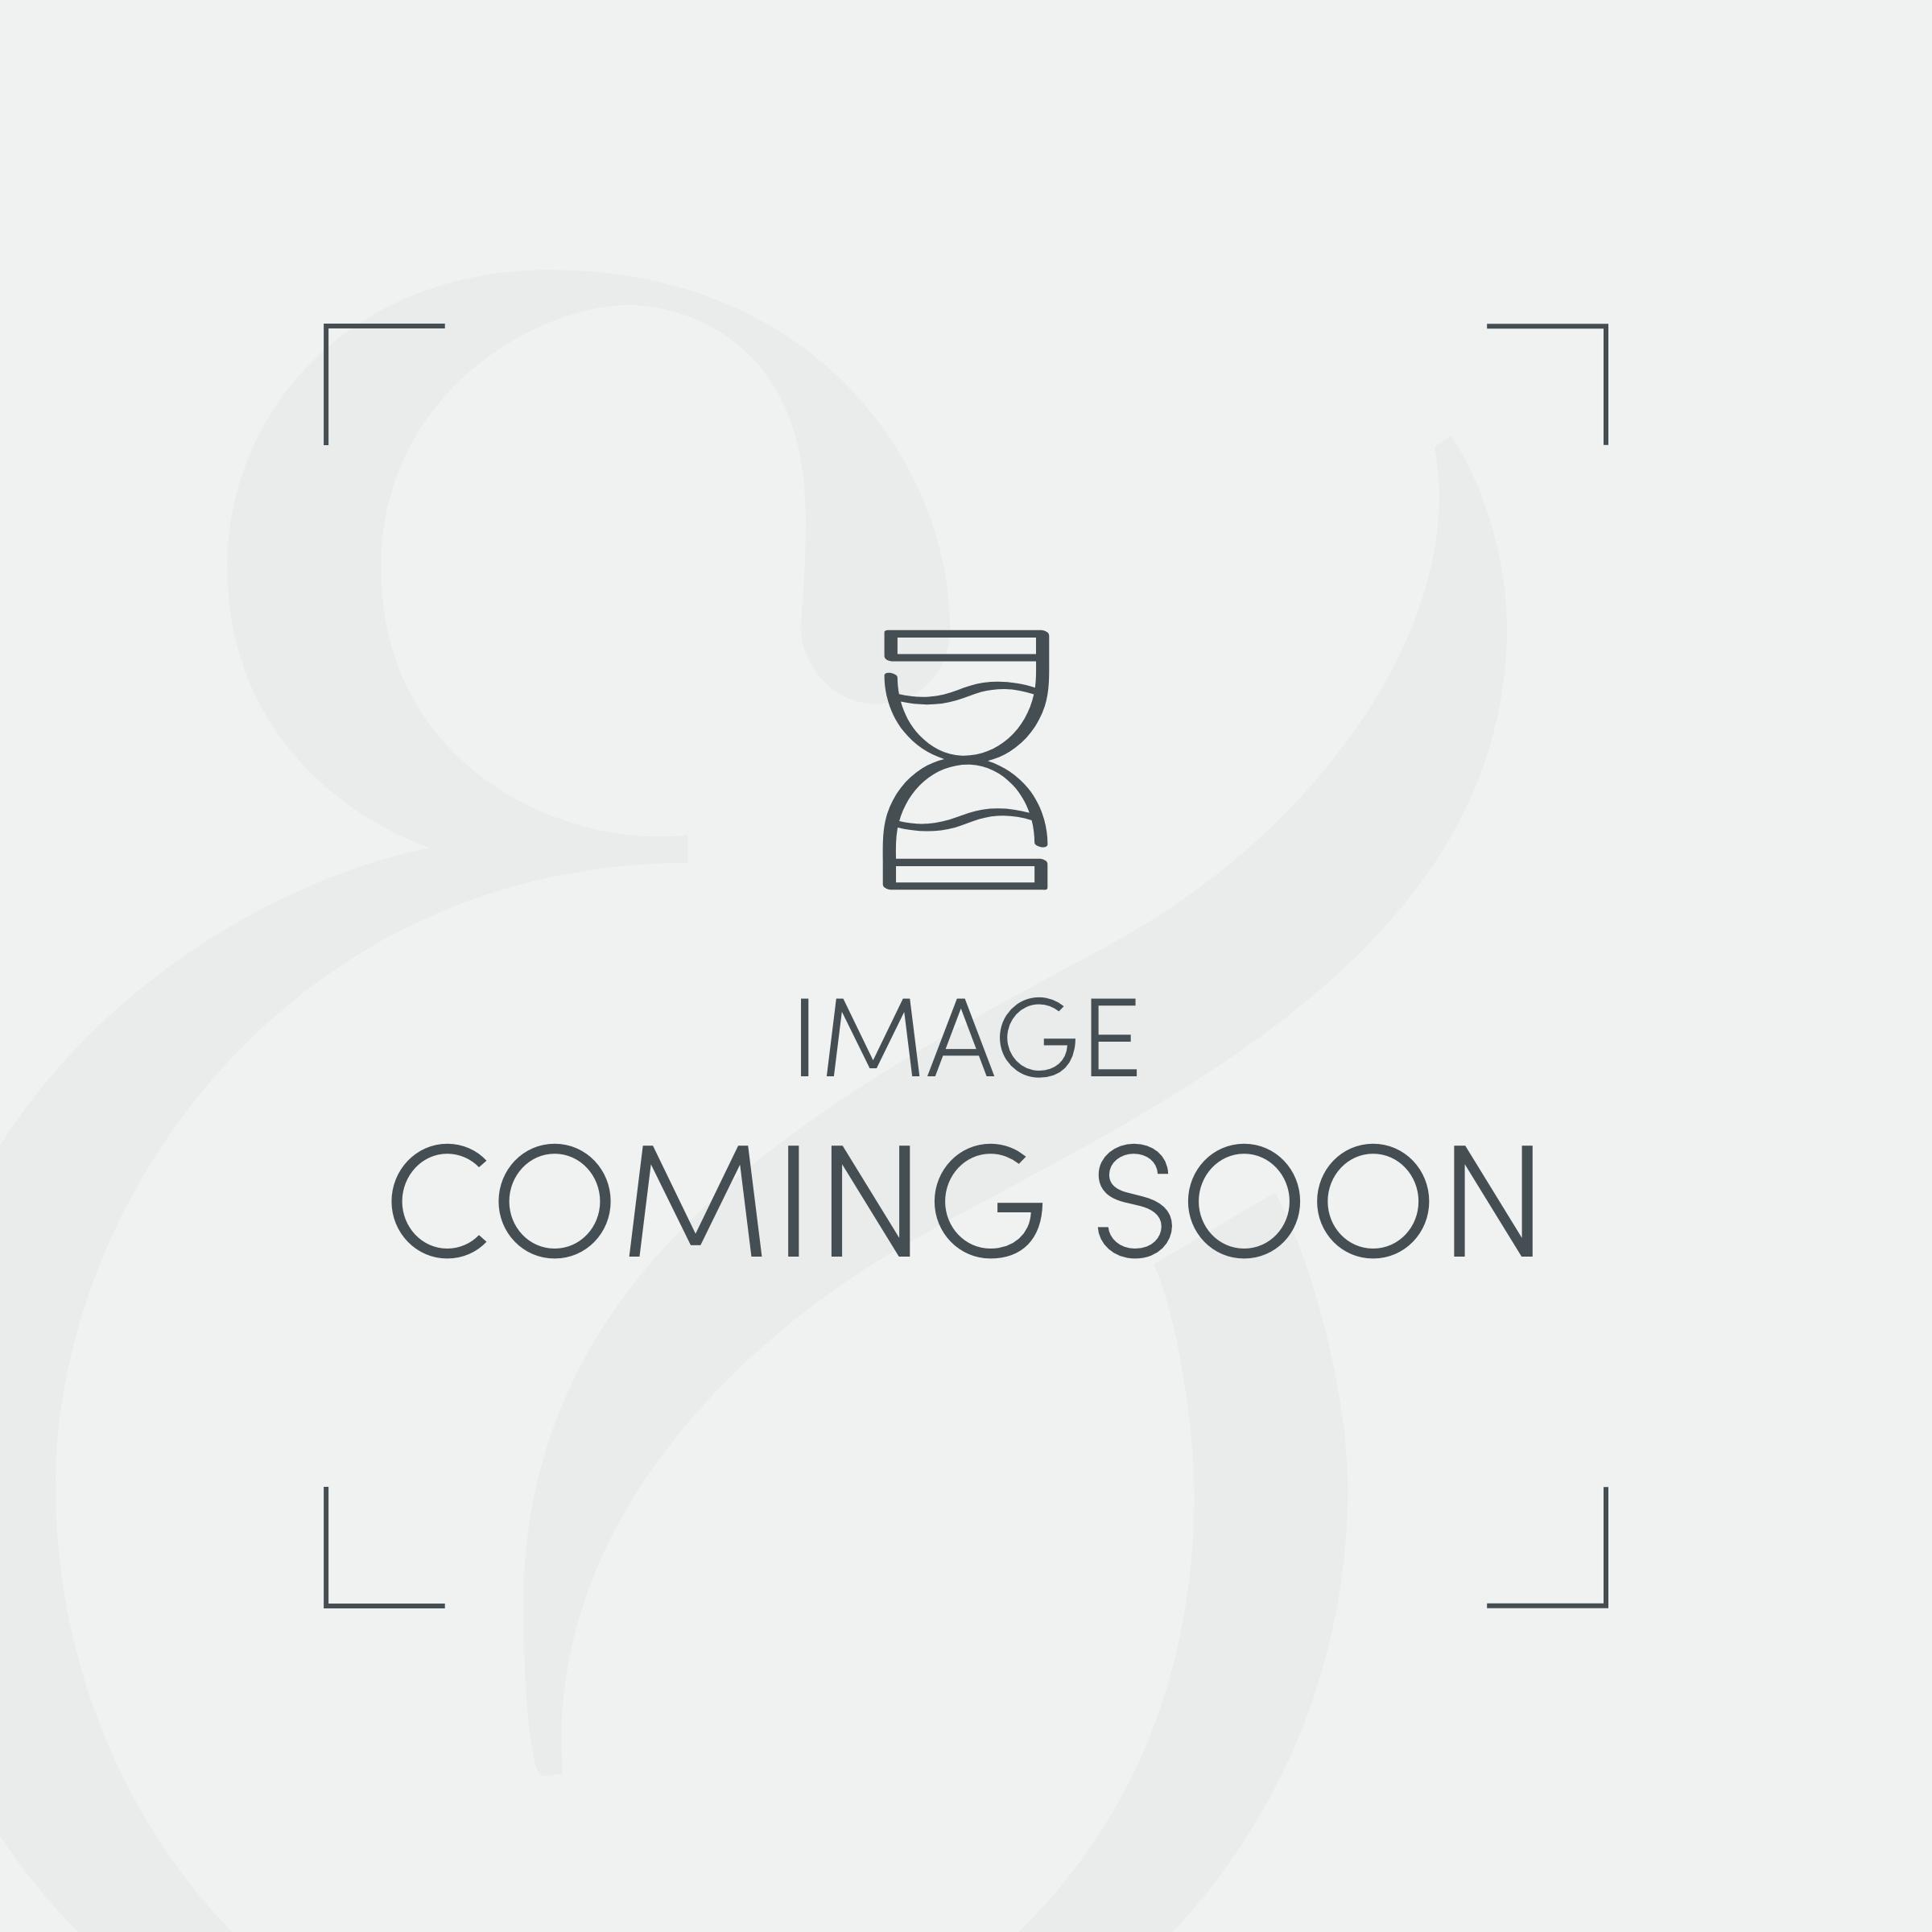 Bed Bug Mattress Cover.Waterproof Anti Bed Bug Pillow And Mattress Encasement